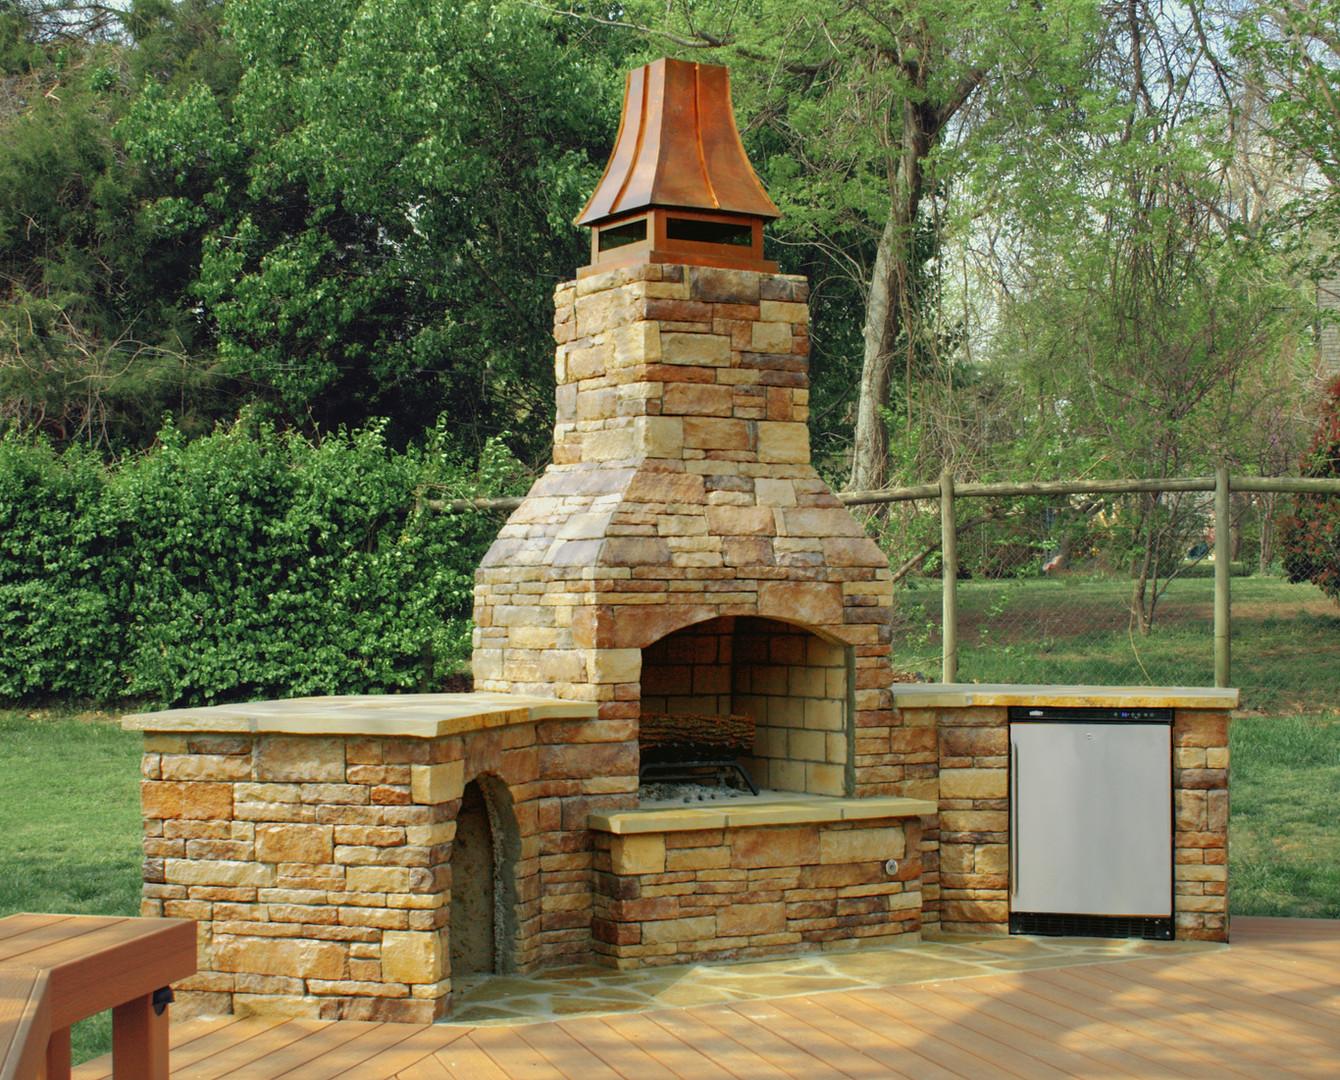 Fireplace Refrigerator Kitchen Outdoor C